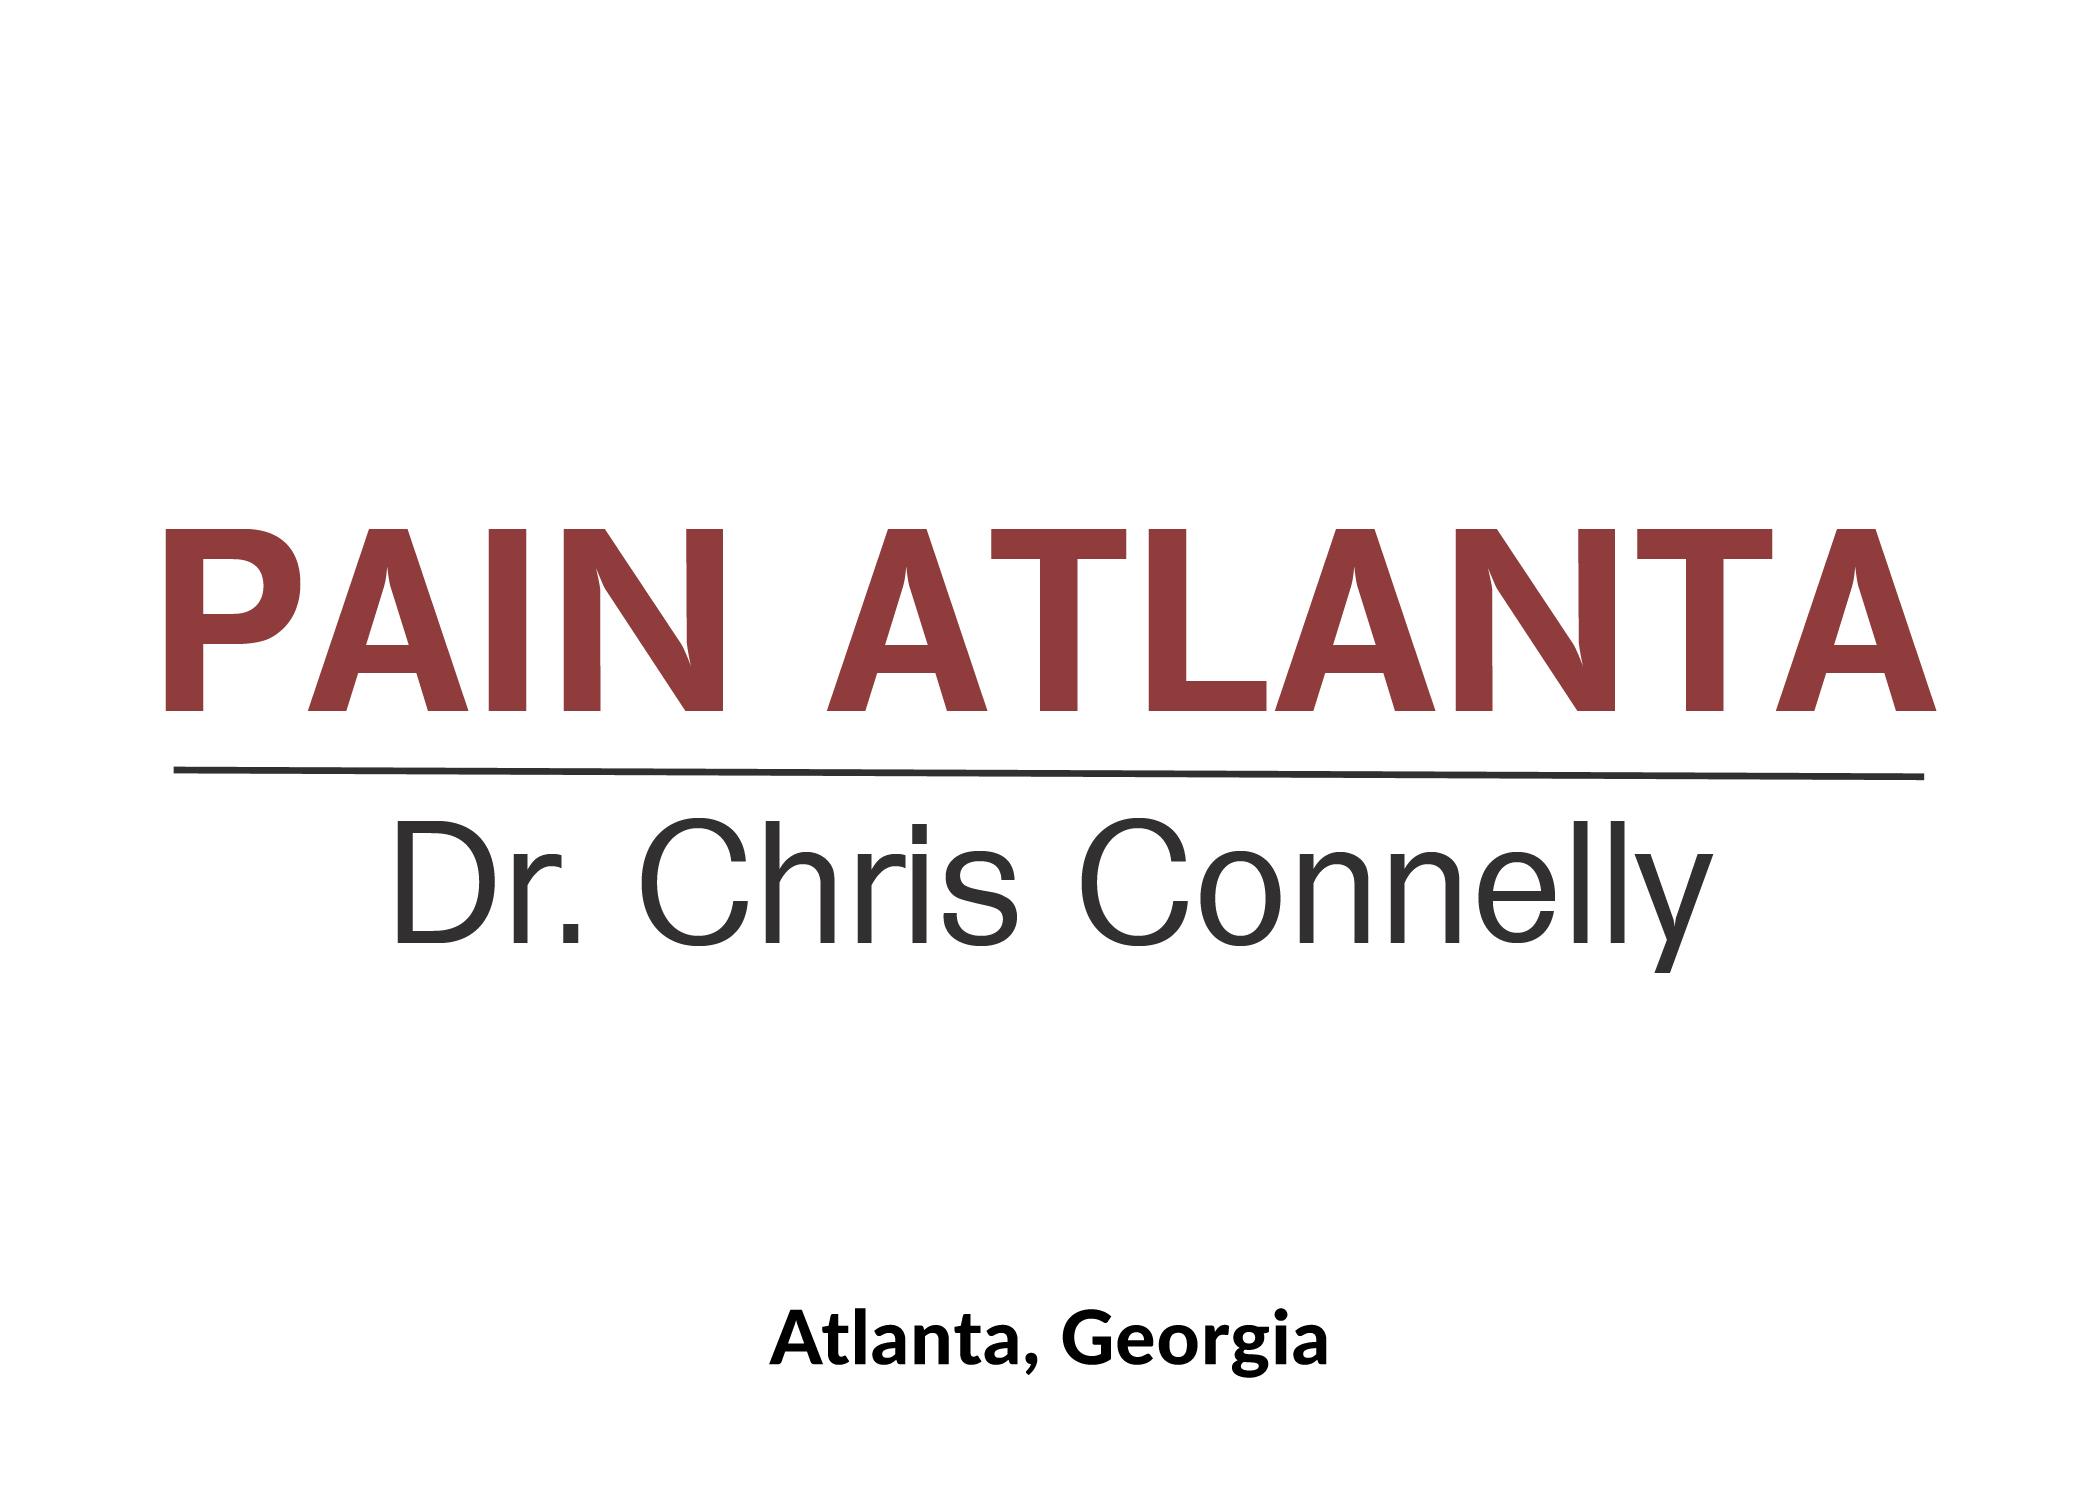 PainAtlanta_allcore_logo.jpg